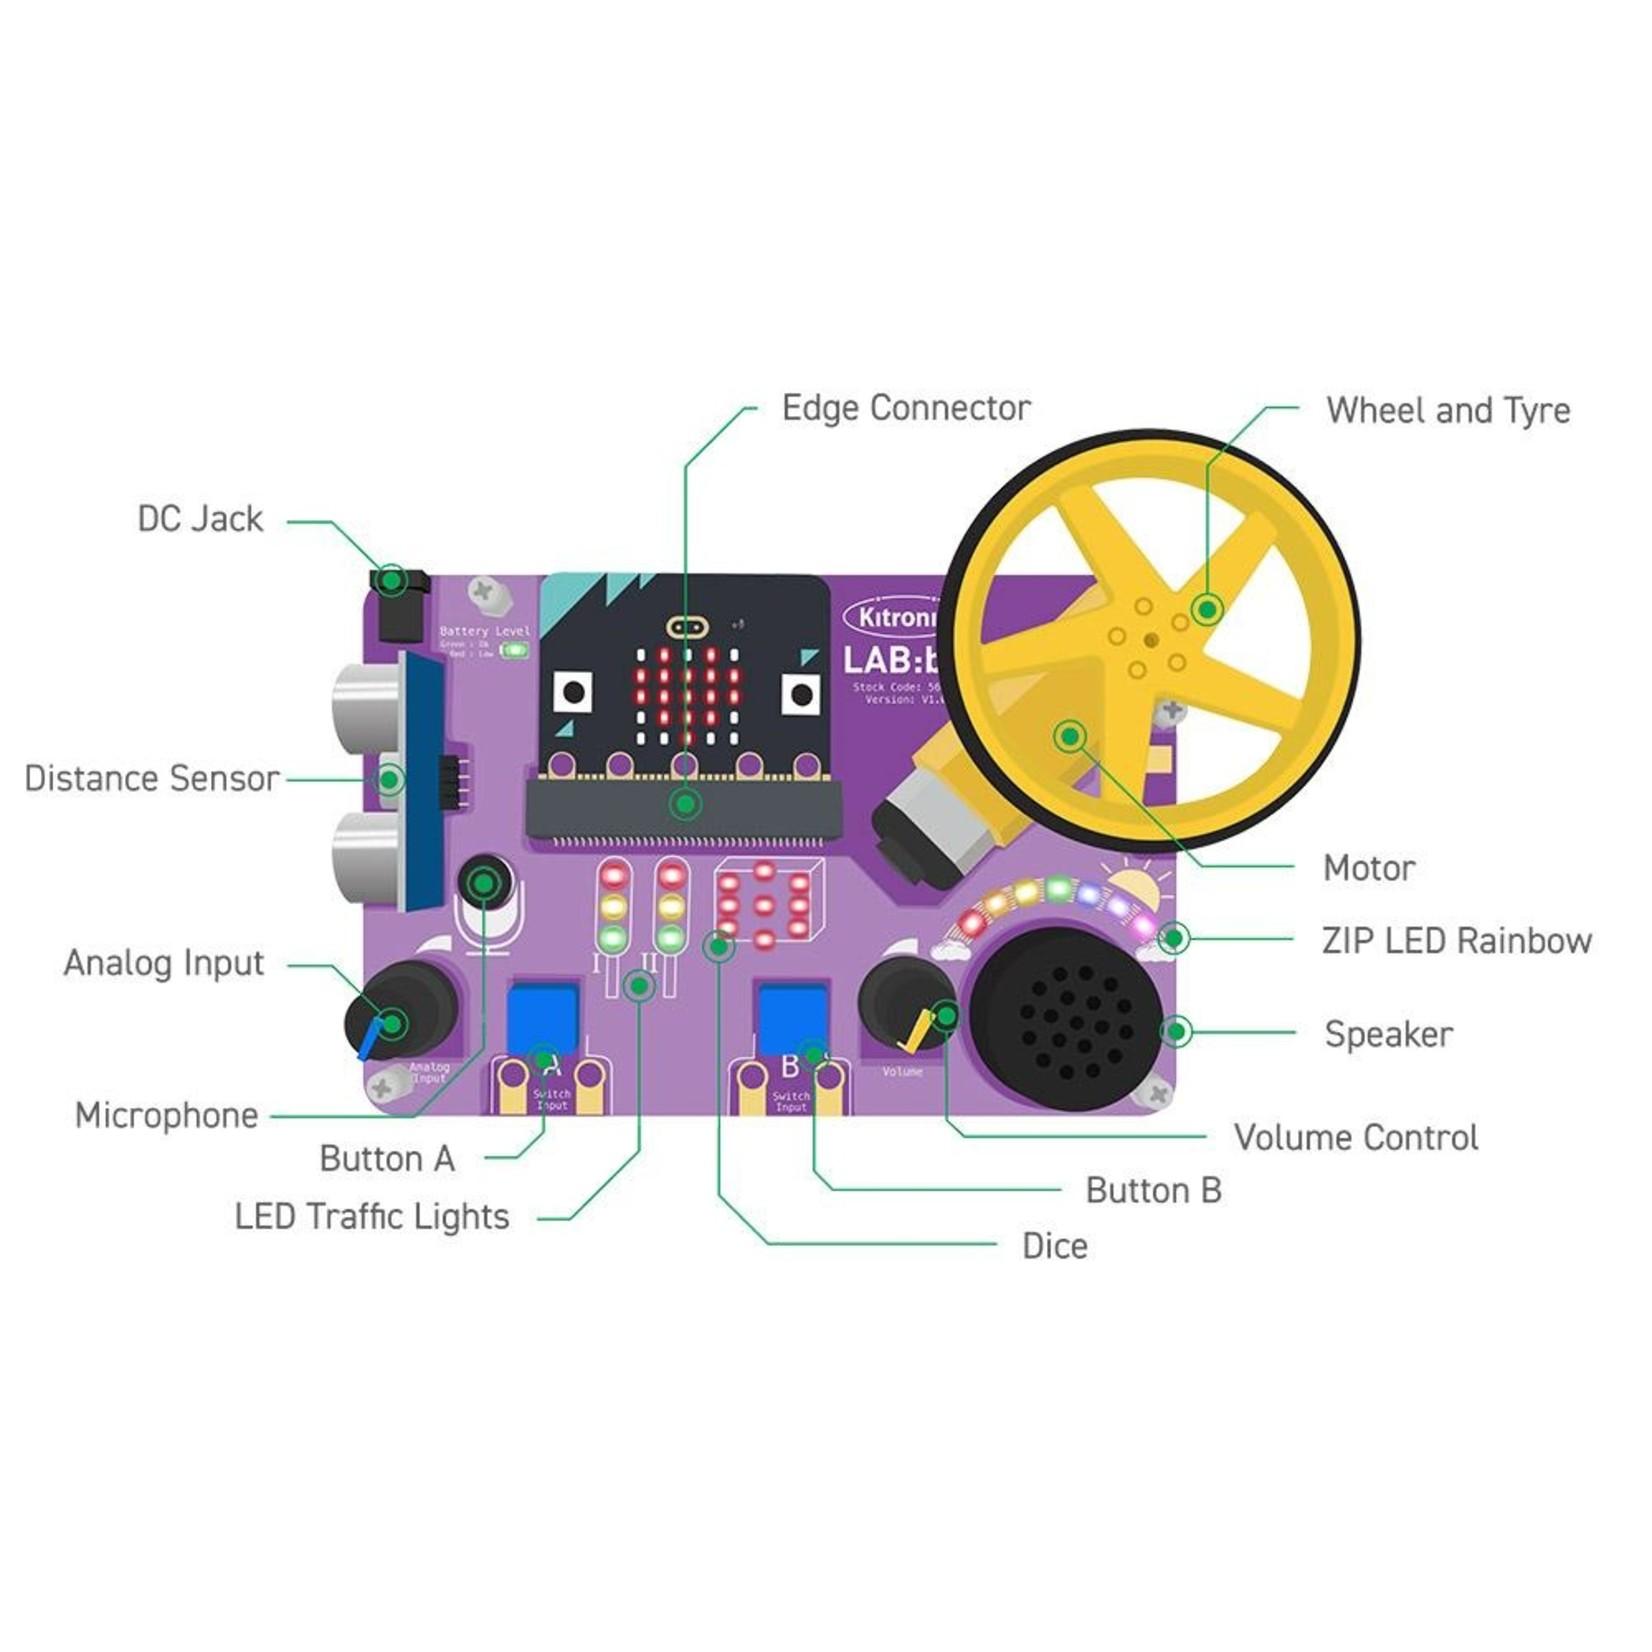 Kitronik LAB:bit educational platform for BBC micro:bit